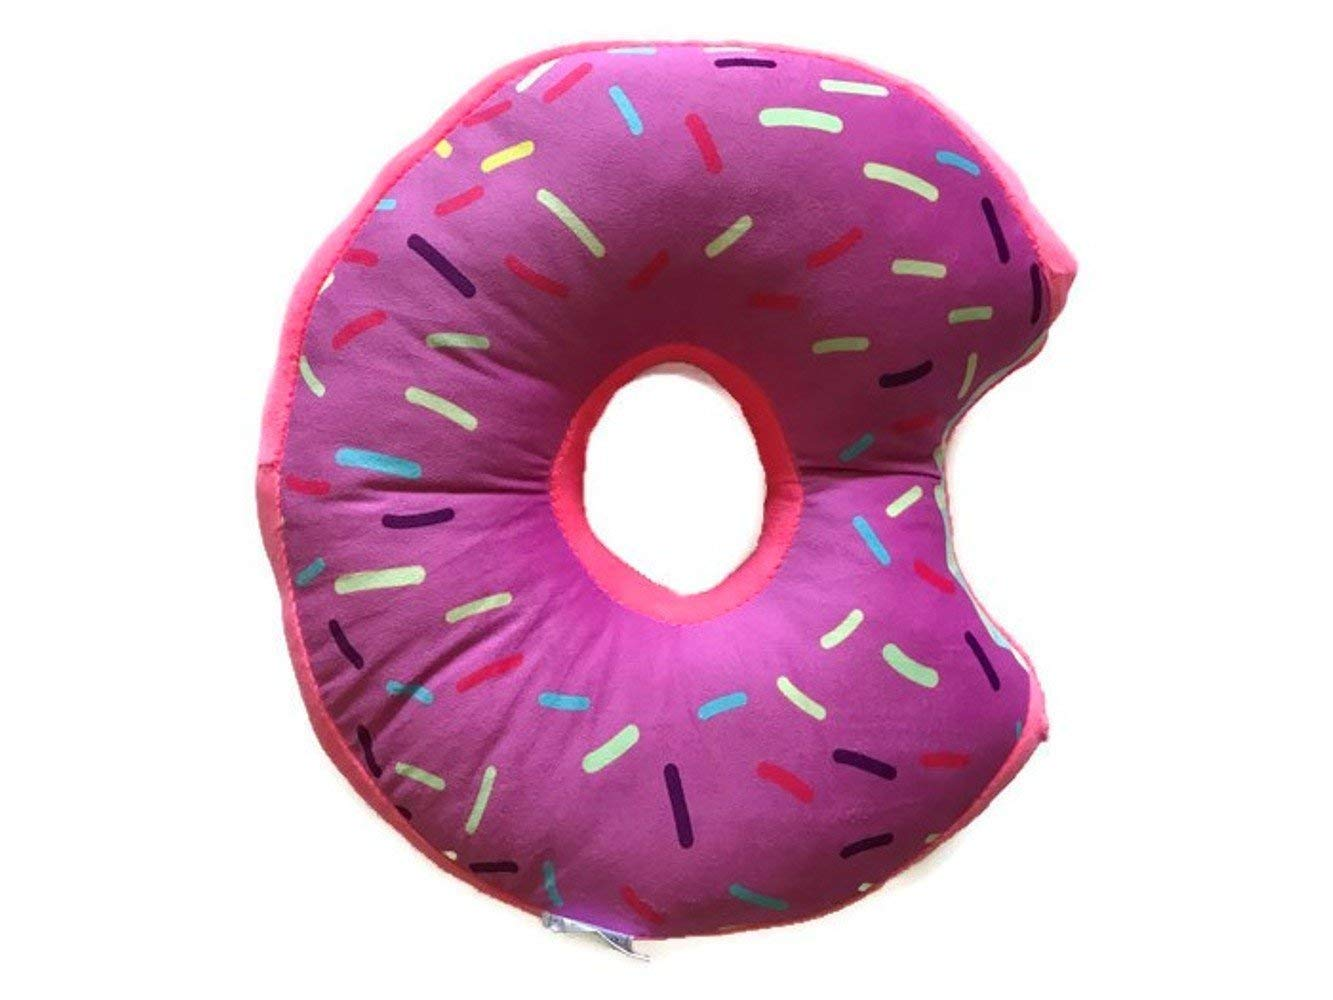 ویکالا · خرید  اصل اورجینال · خرید از آمازون · Donut Plush Pillow Stuffed Cushion Soft Toy Decor, 14 Inches (Pink Icing) wekala · ویکالا